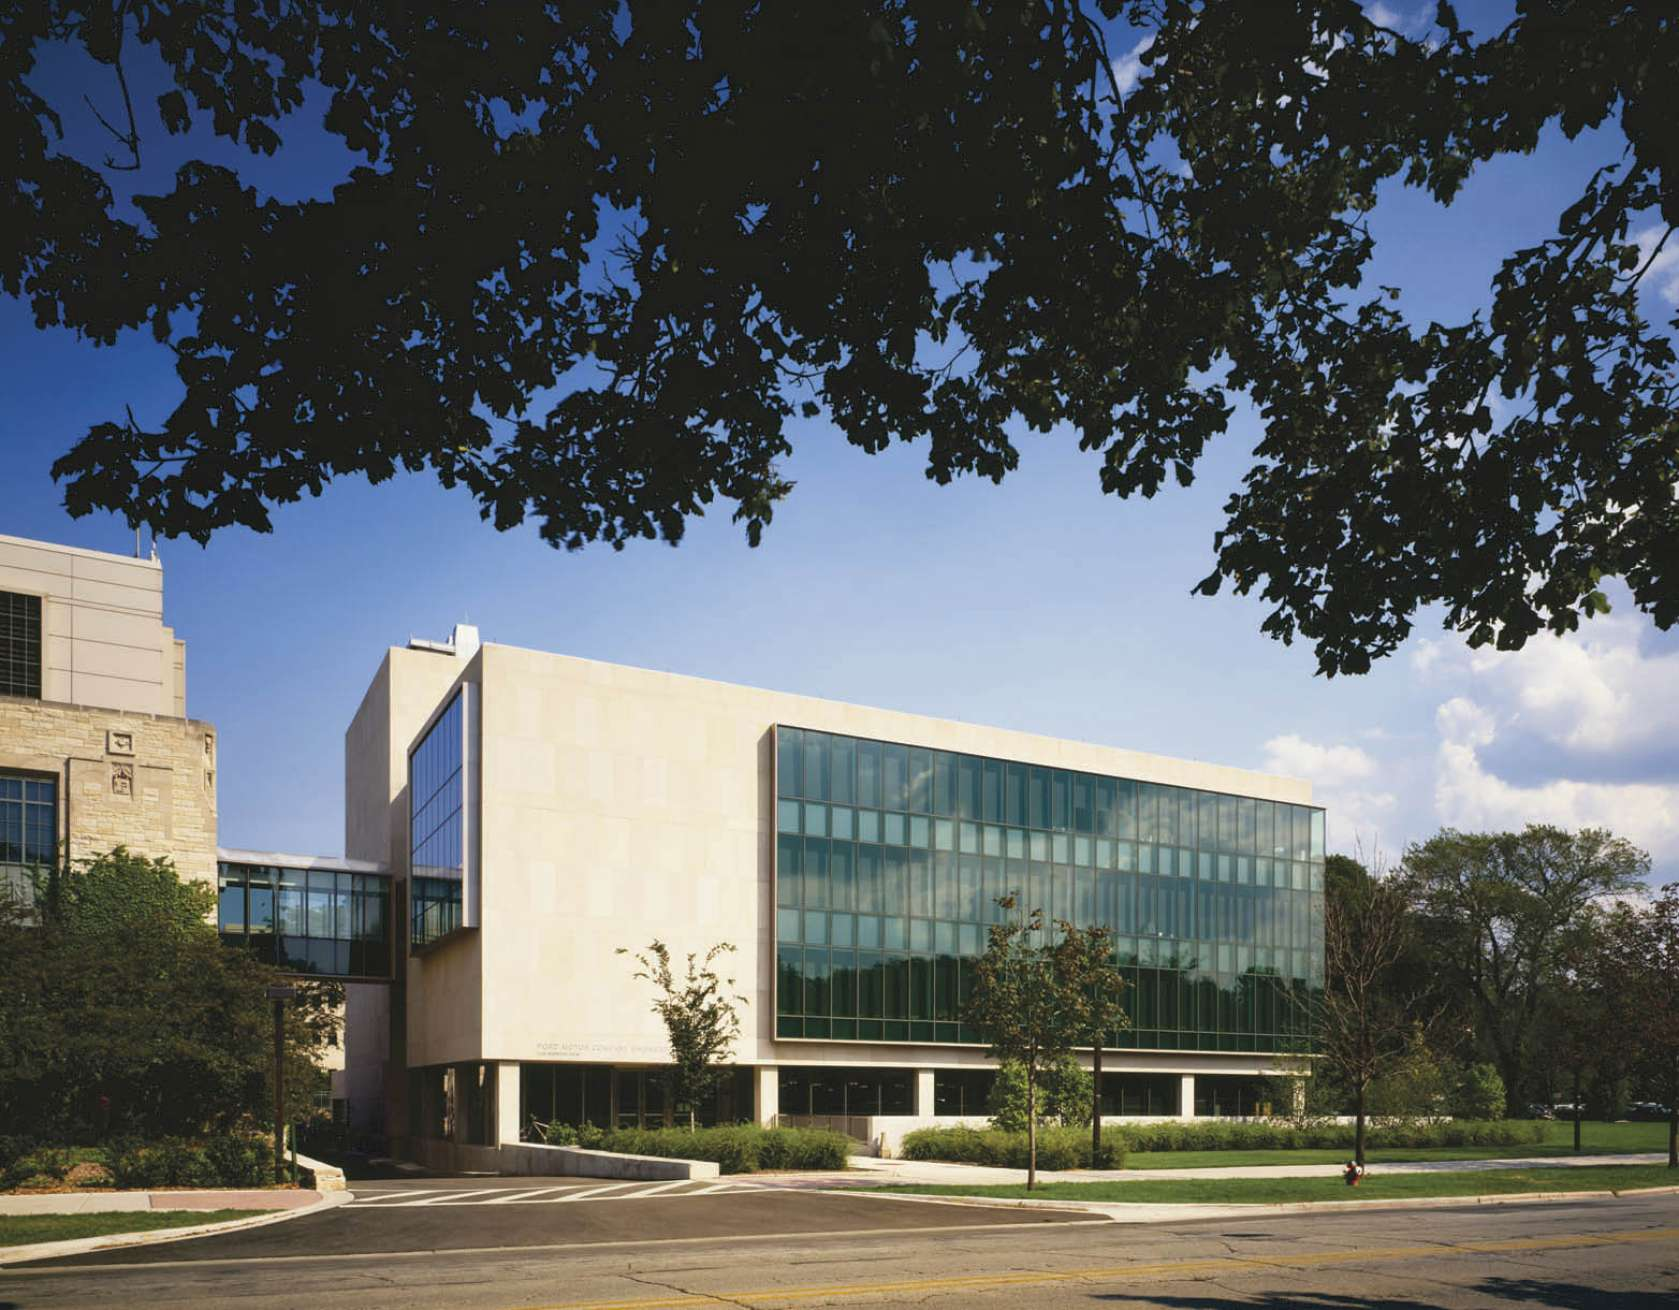 Northwestern University Ford Motor Company Engineering